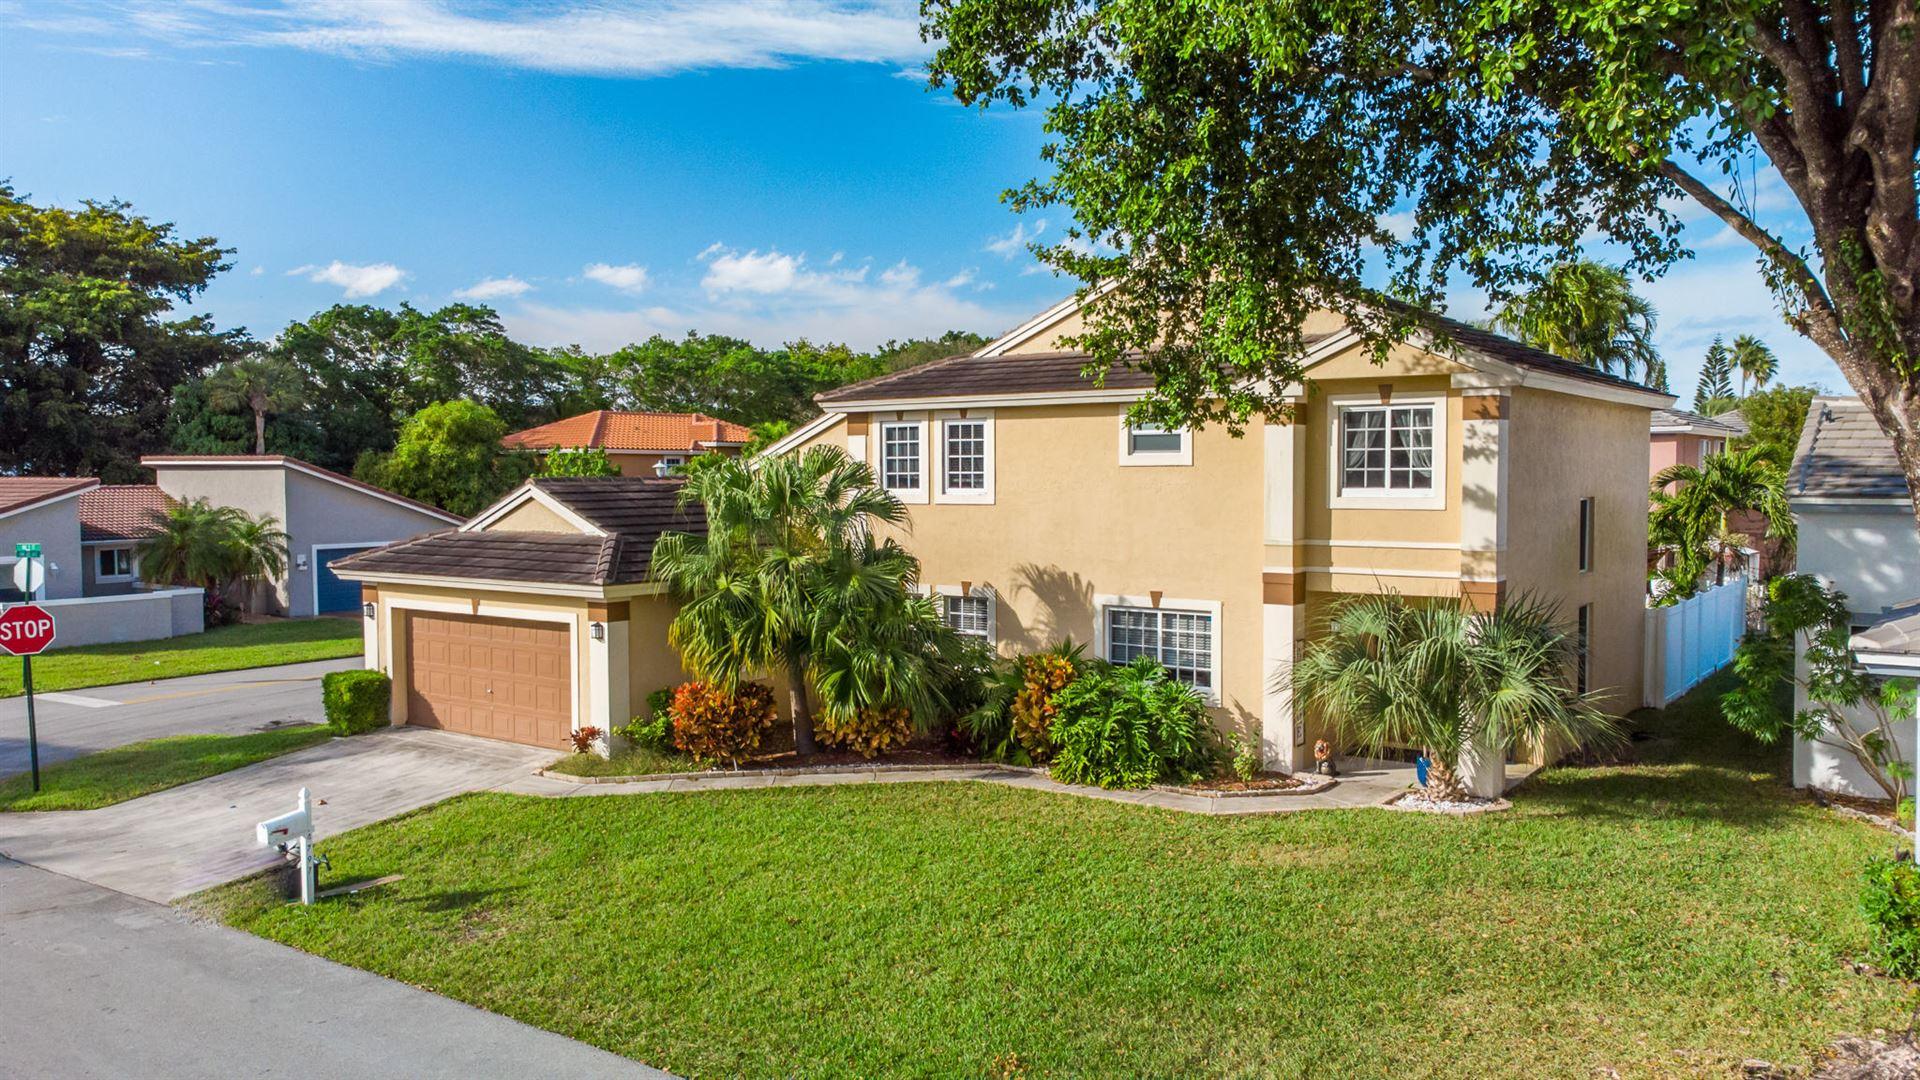 4797 NW 5th Street, Deerfield Beach, FL 33442 - #: RX-10683498